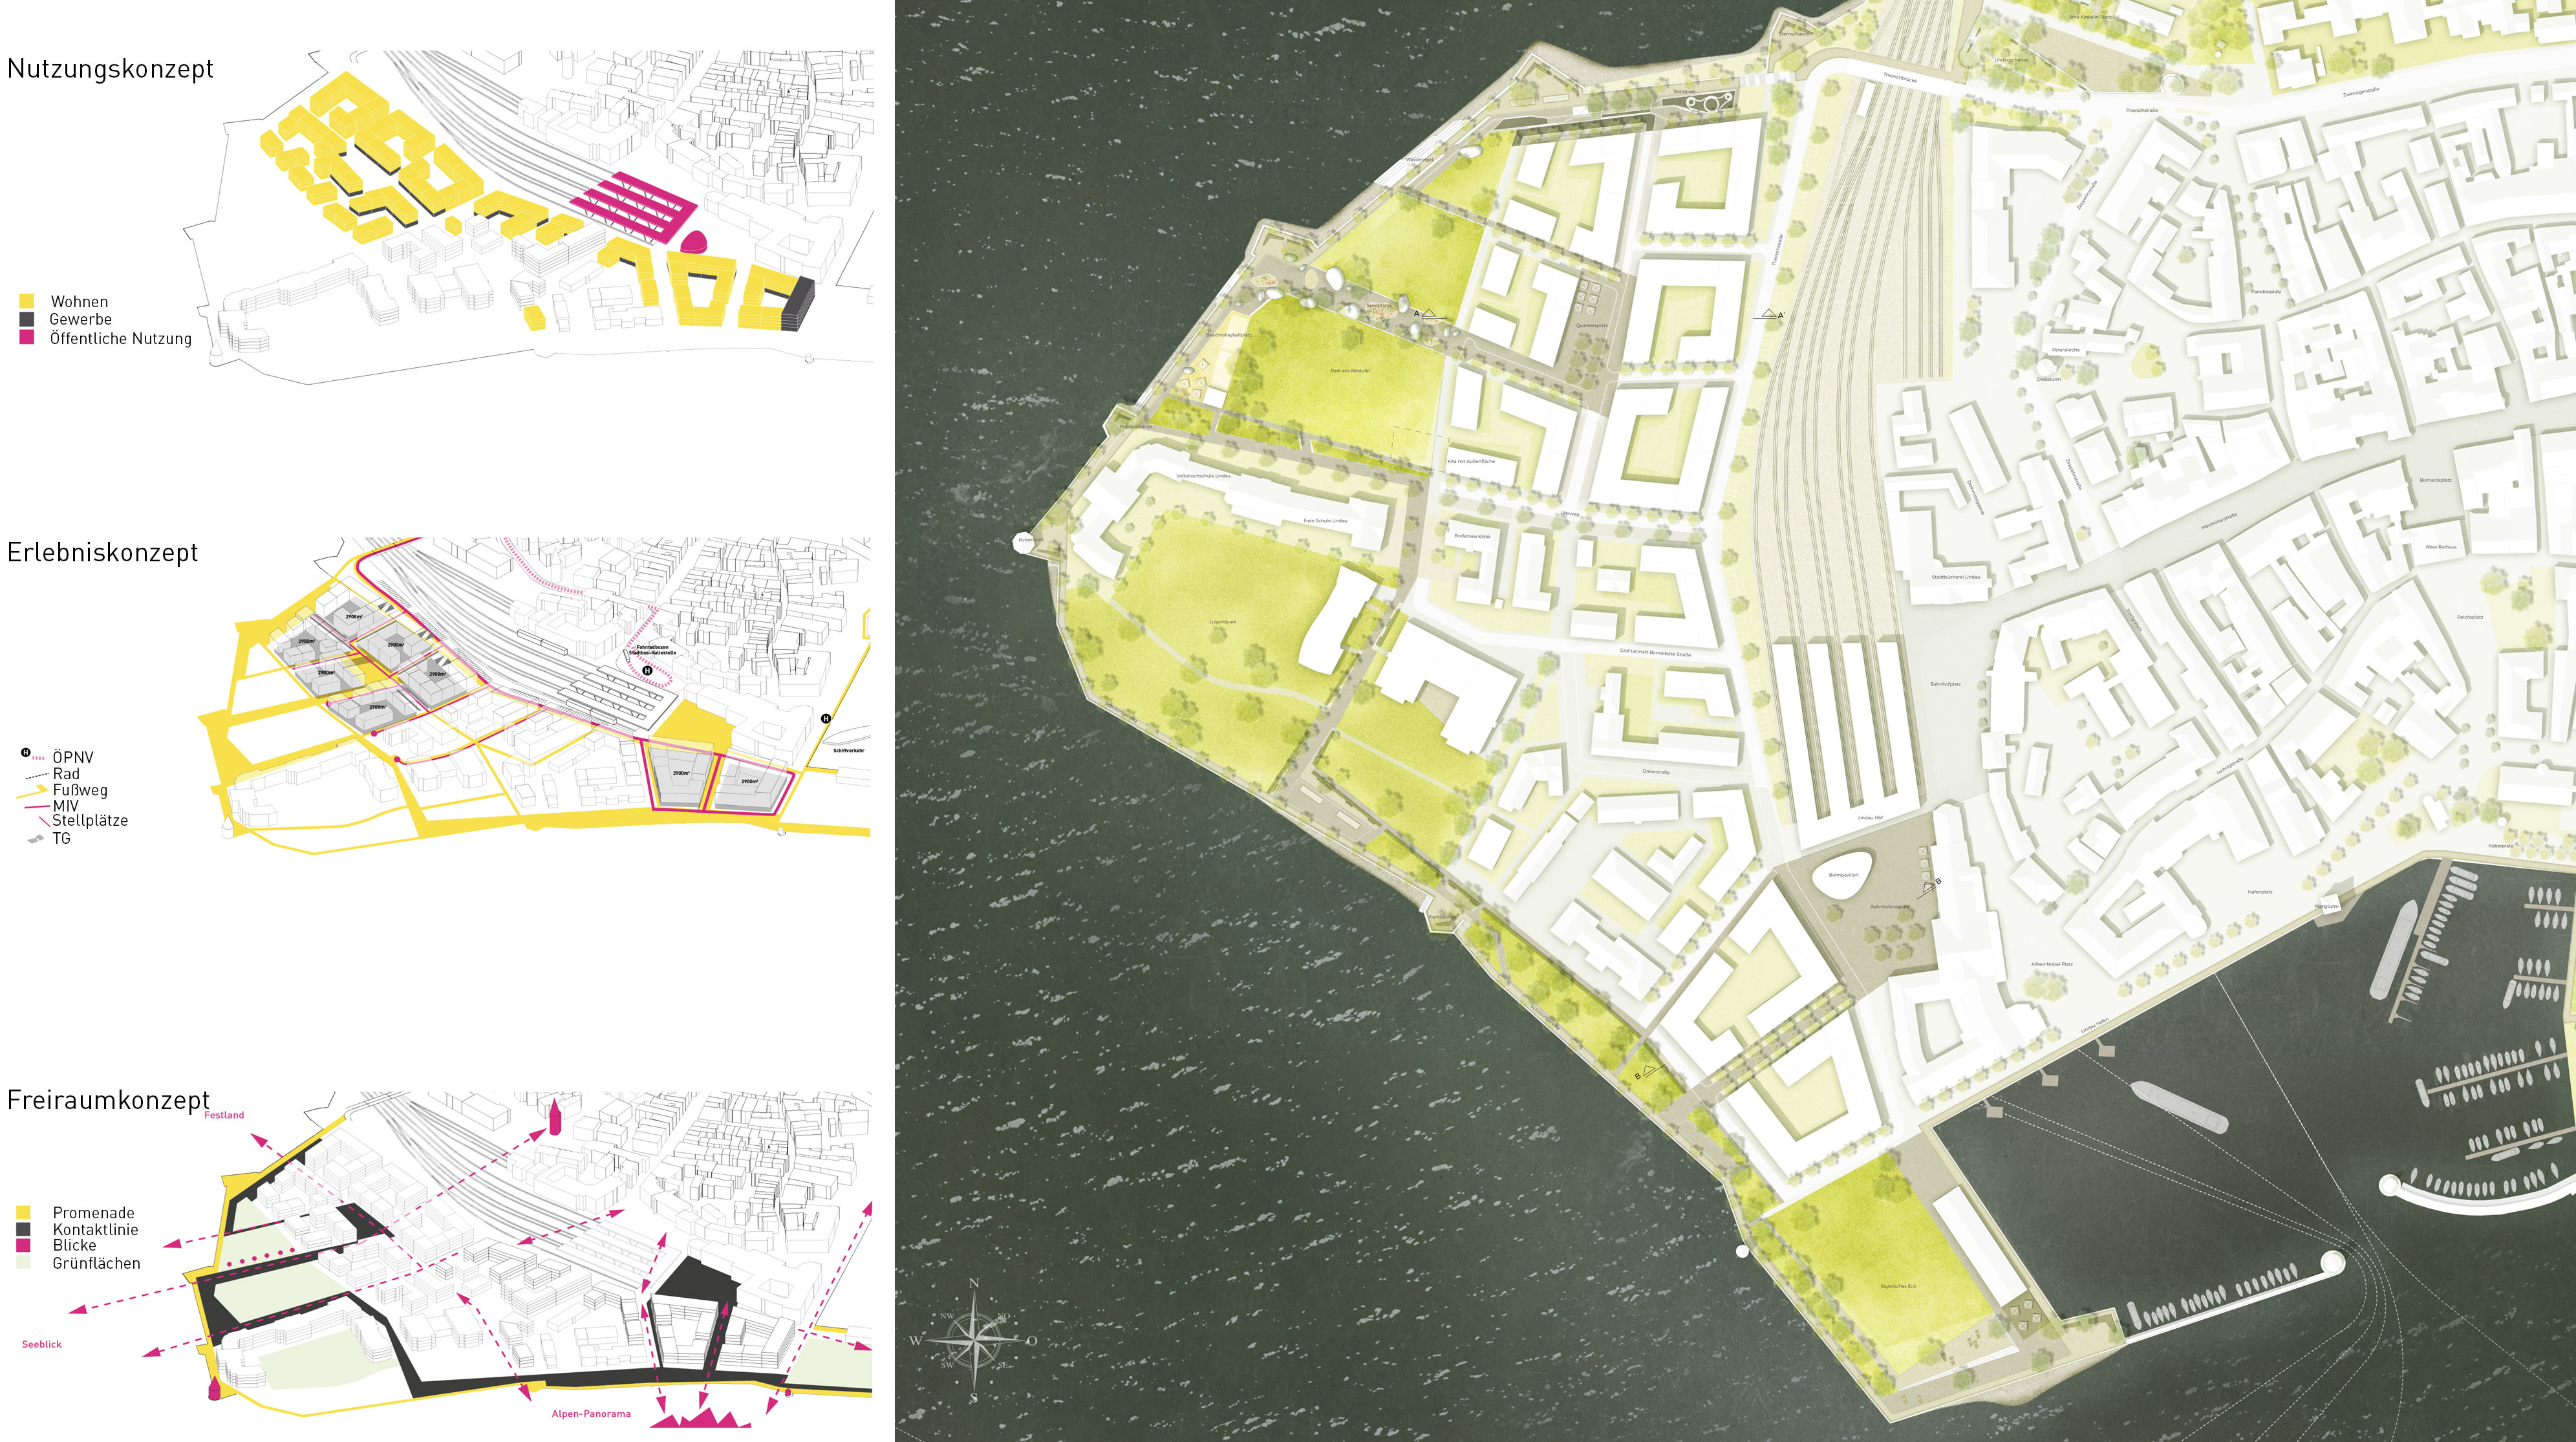 Lindau Hintere Insel Lageplan Städtebau